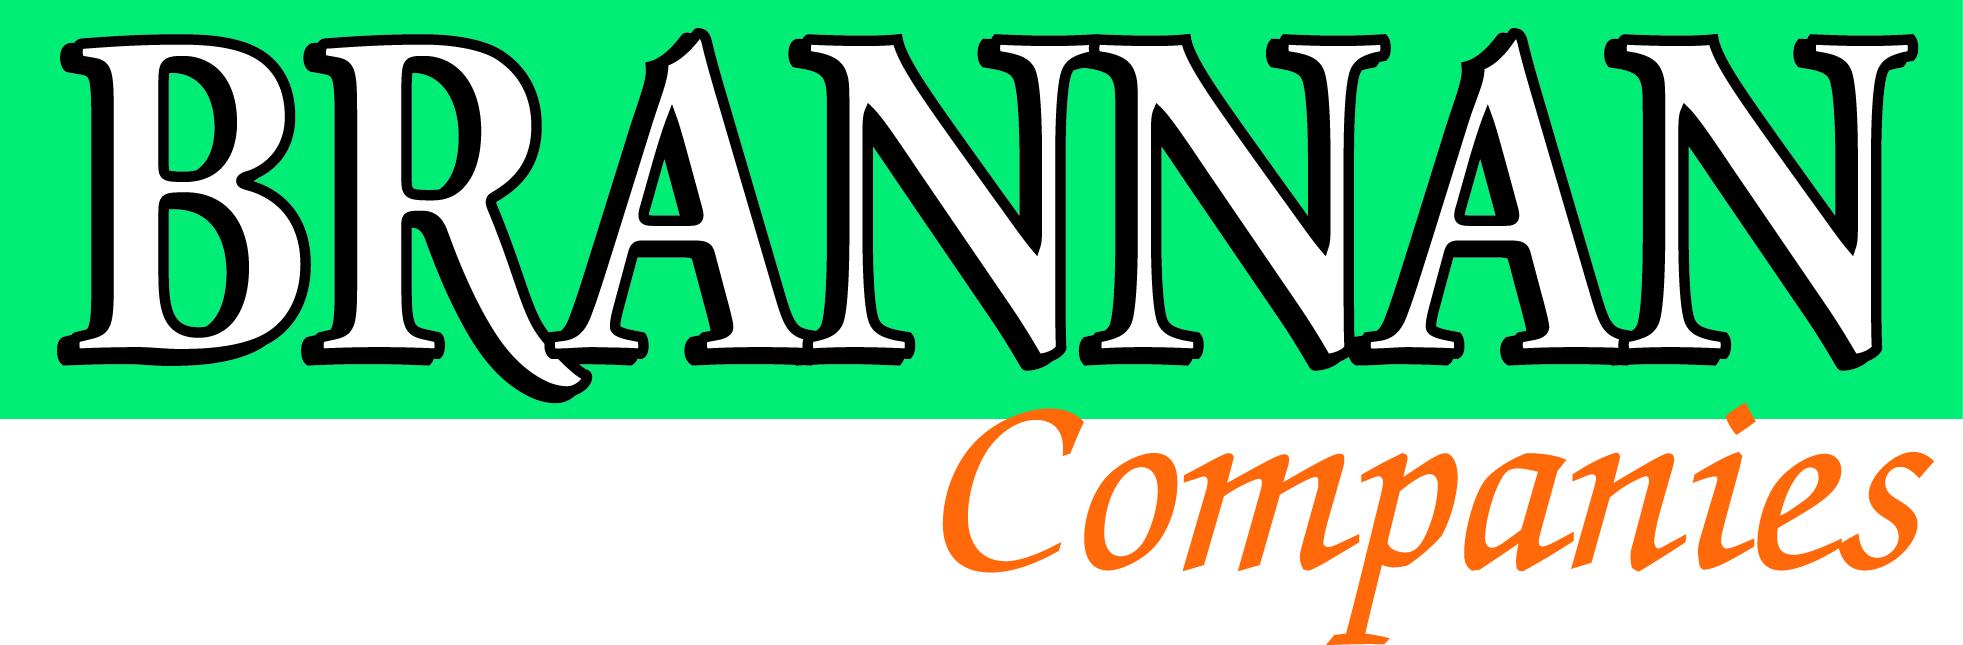 BrannanCompanies_Logo4c